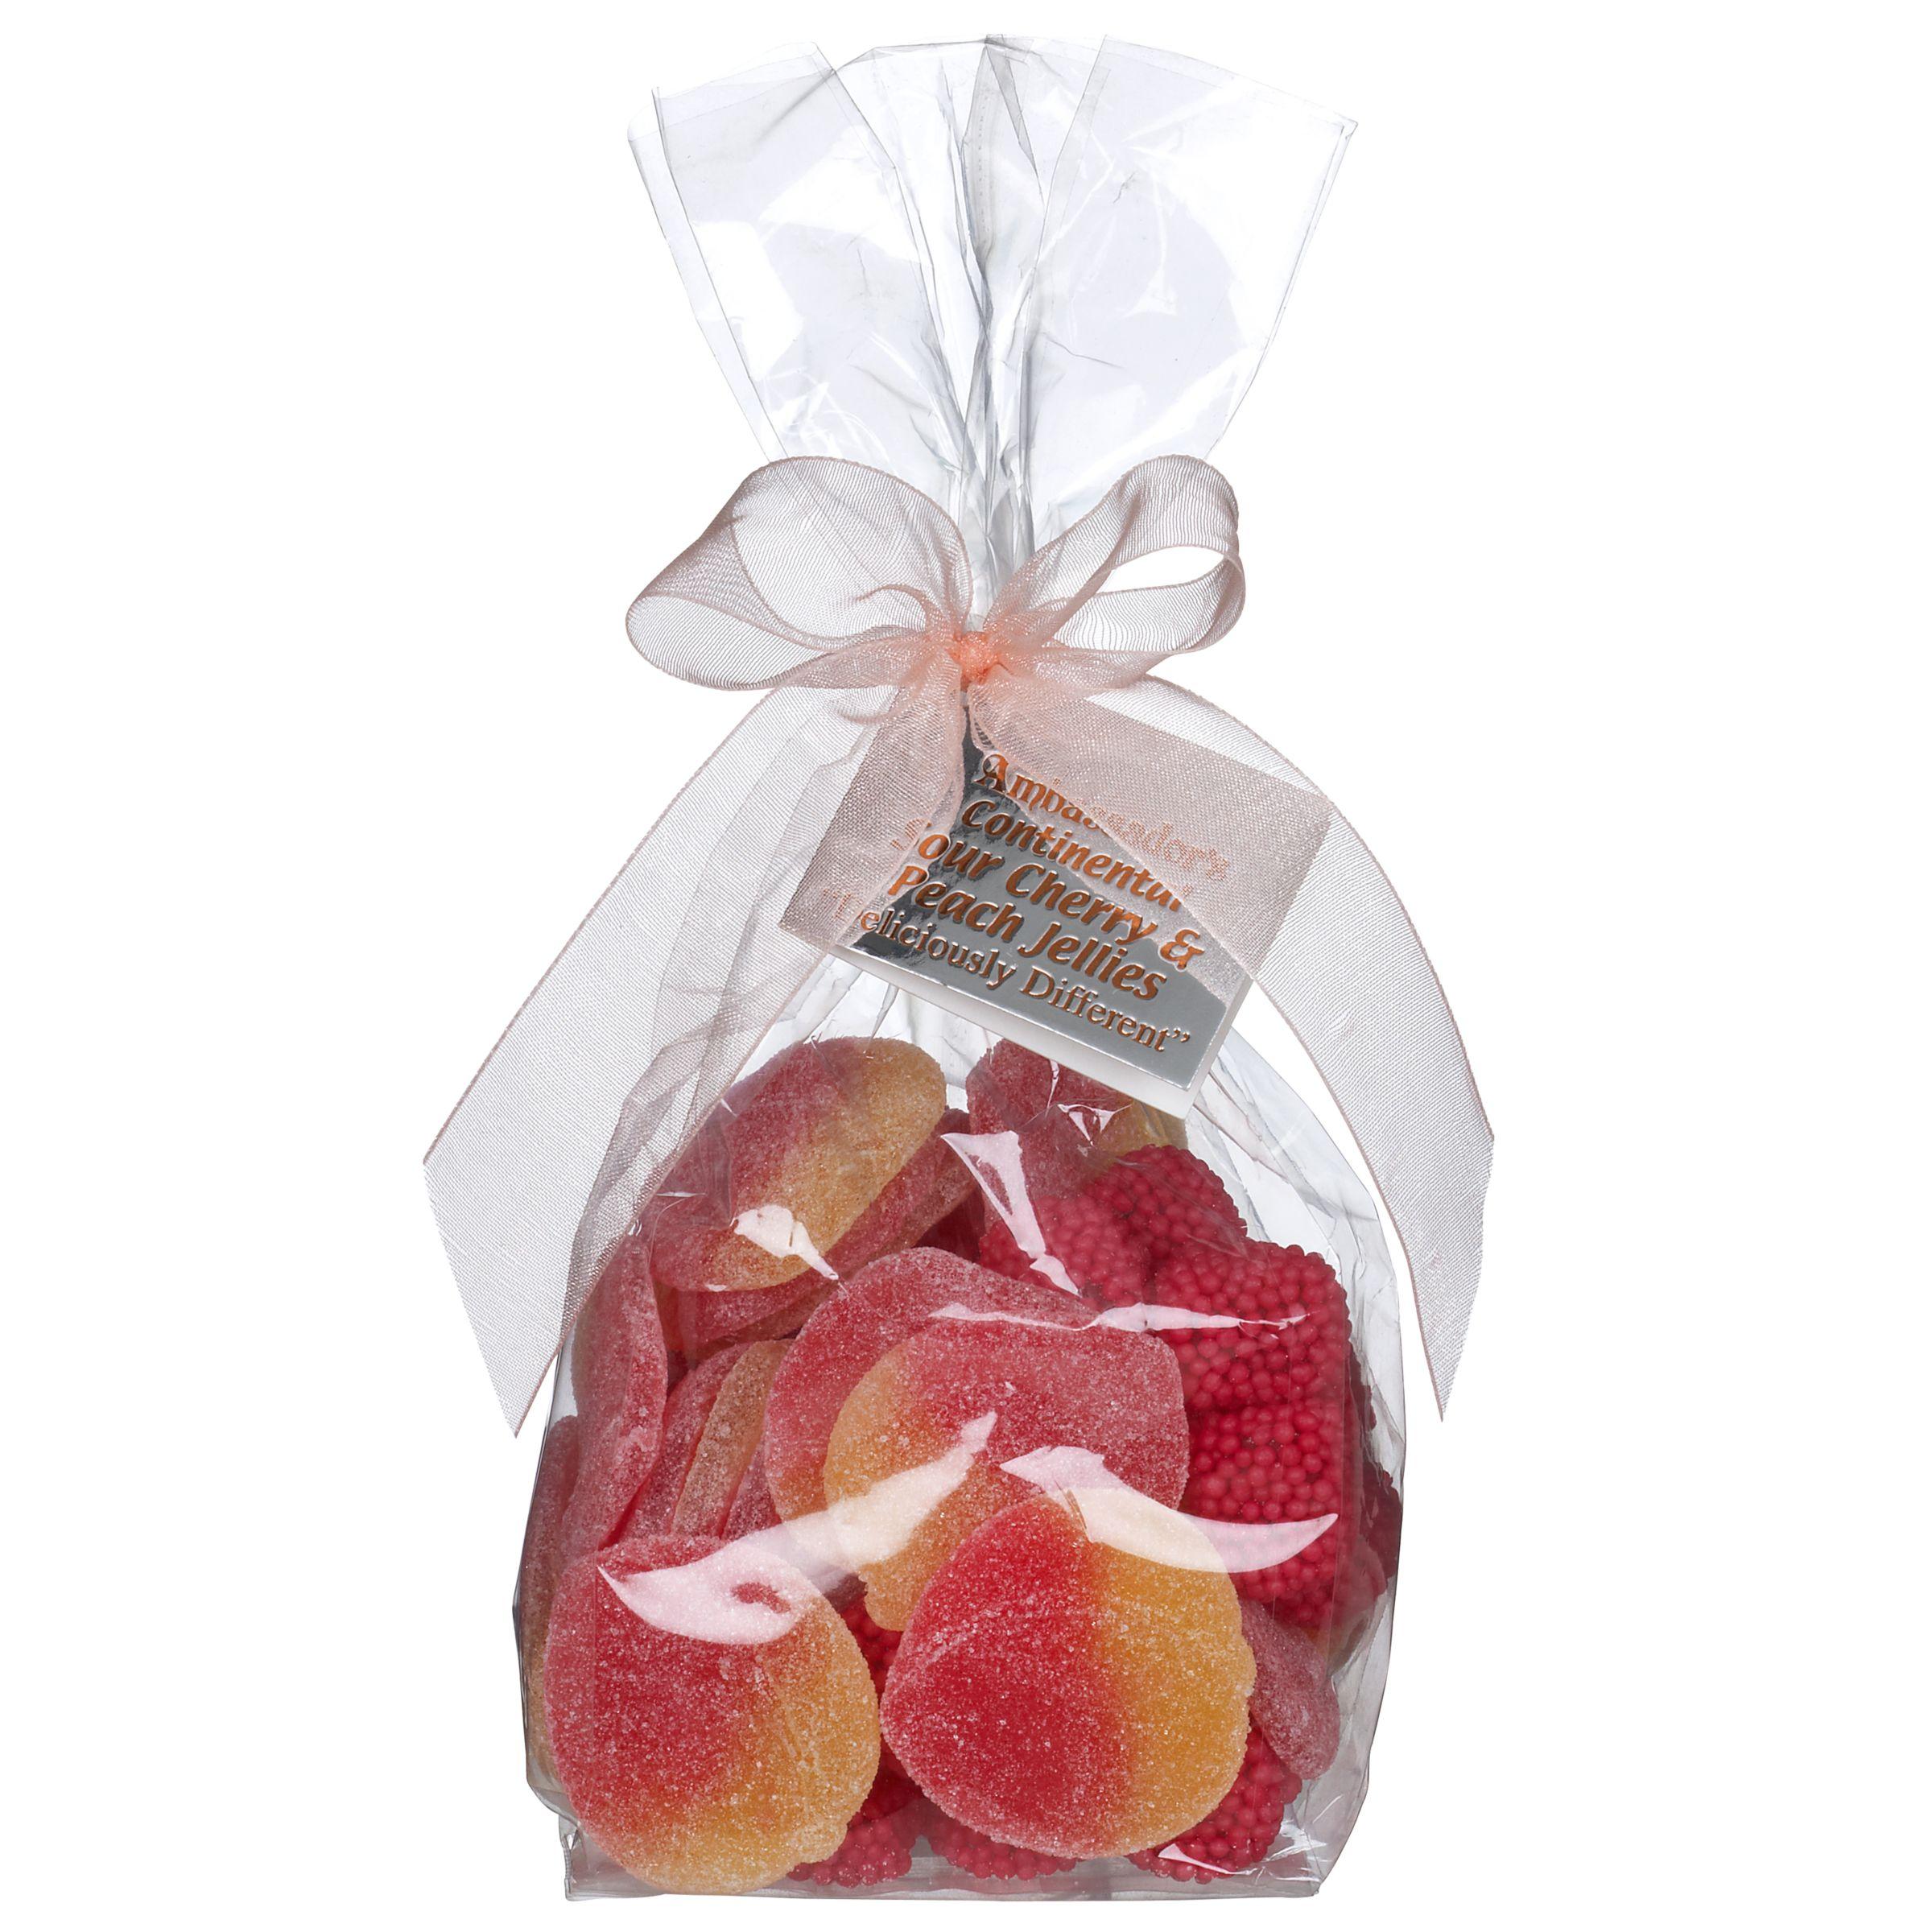 Ambassadors of London Ambassadors of London Peach and Raspberry Jellies, 250g